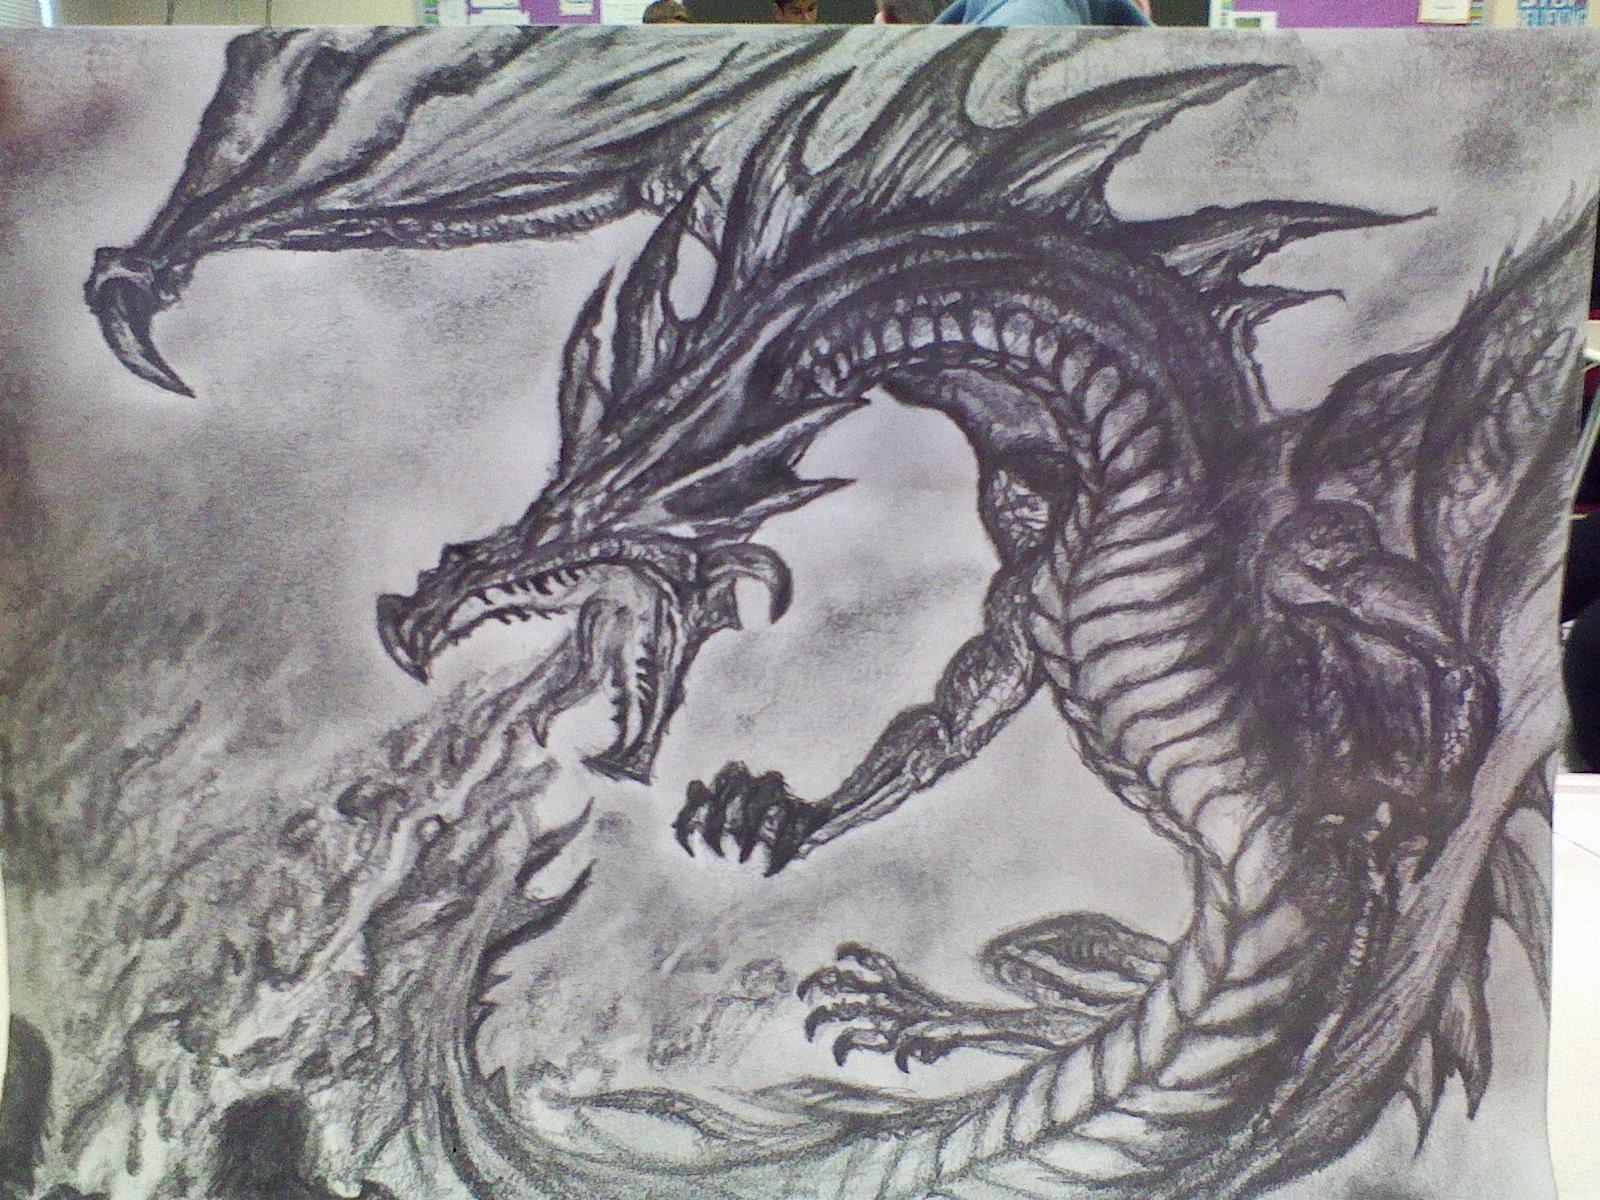 Graphite Drawings: Fire-breathing Beast